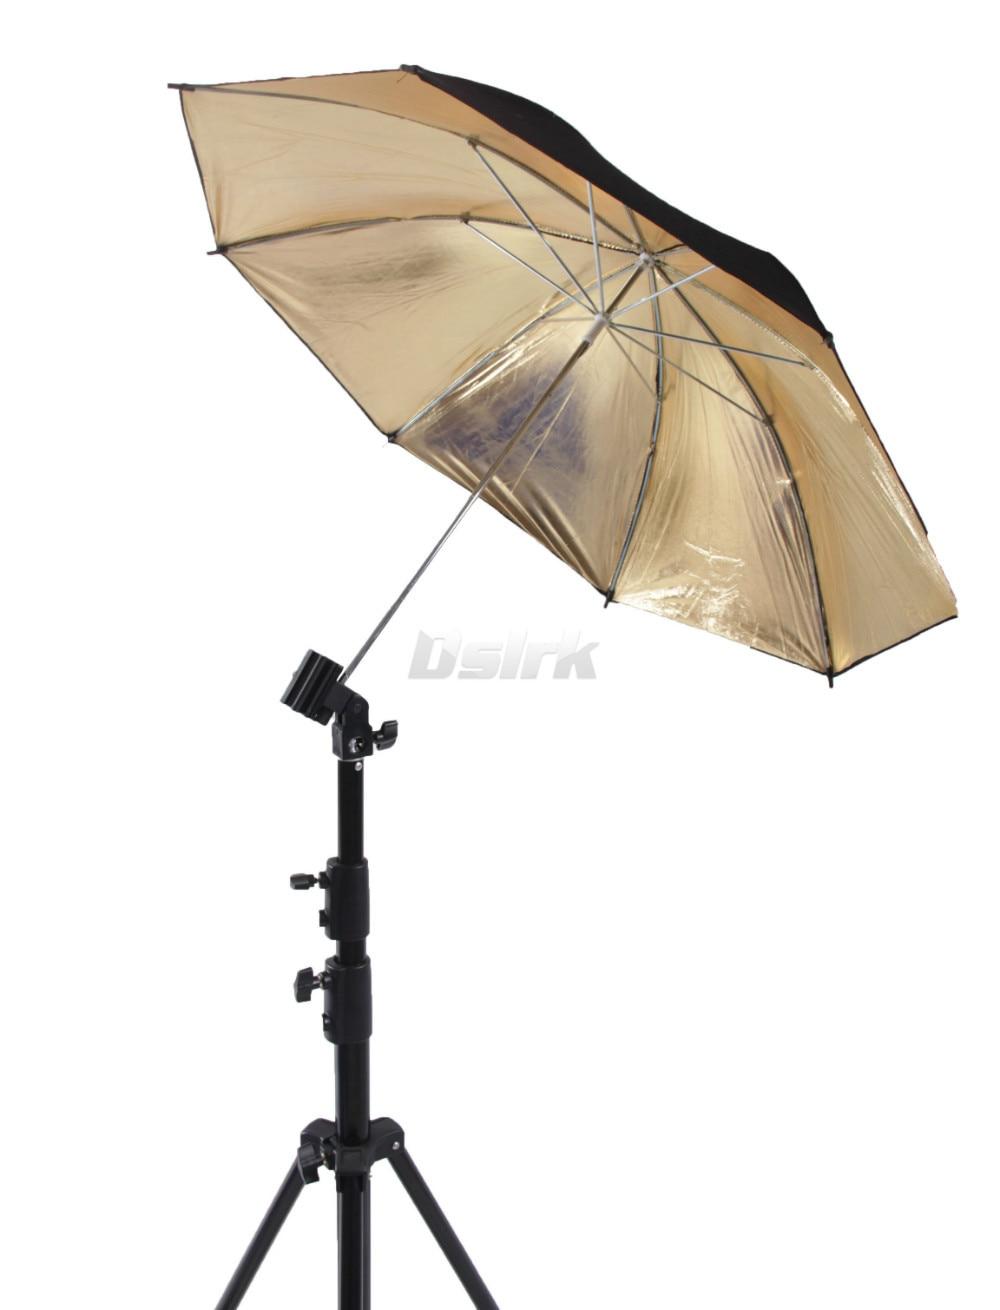 ASHANKS 33in 83cm Reflector Umbrella Photography Accessaries Reflective Black Gold Golden Umbrella for Photo Studio Flash Light